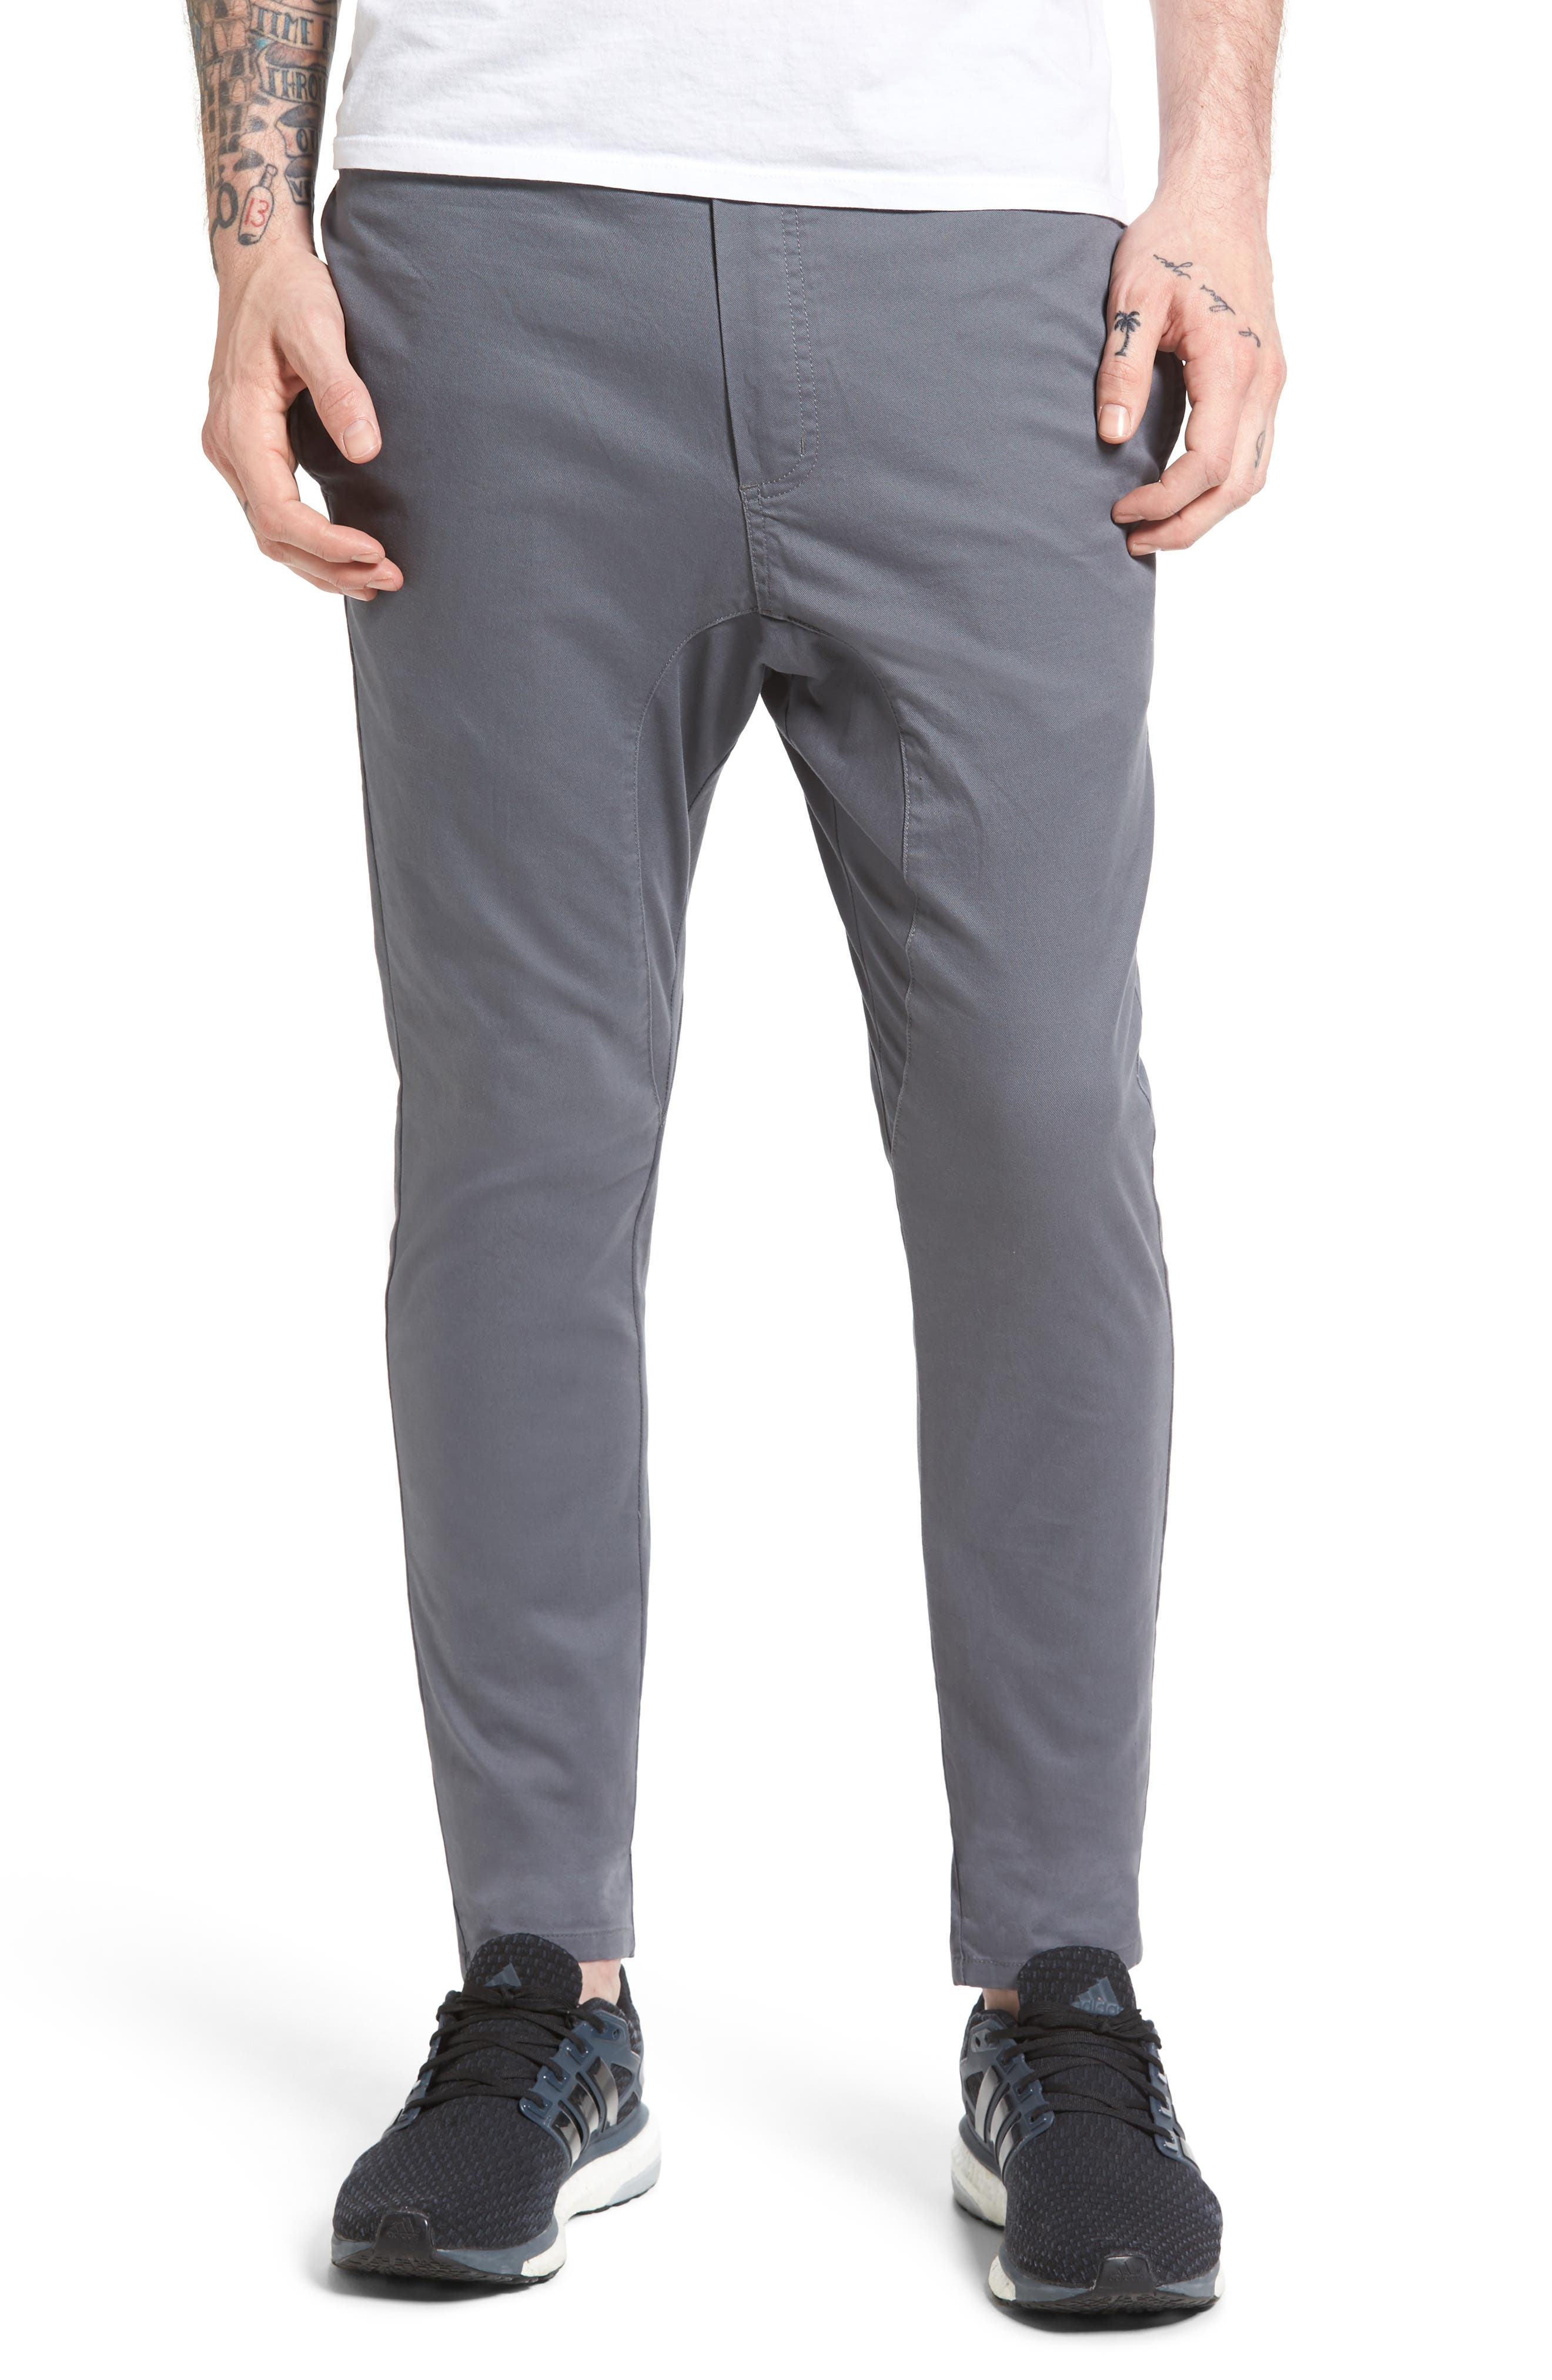 Salerno Stretch Woven Jogger Pants,                         Main,                         color, Grey